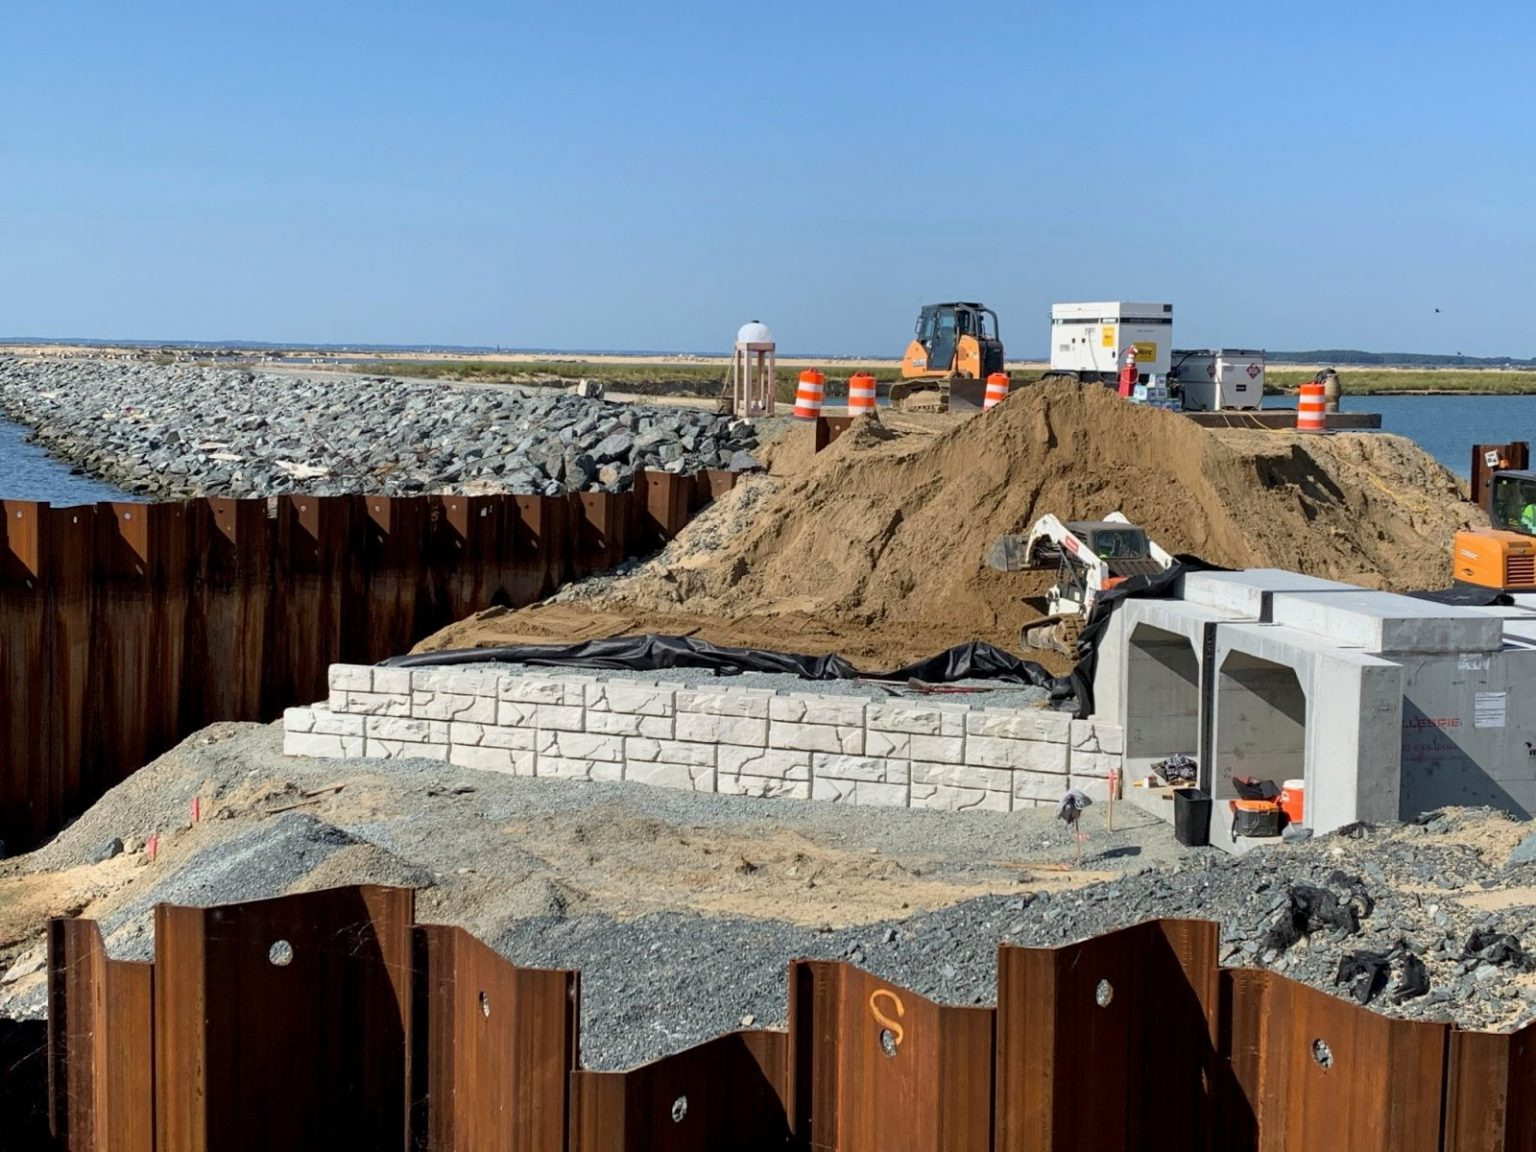 MaxumStone Retaining Wall Ledge Face Under Construction